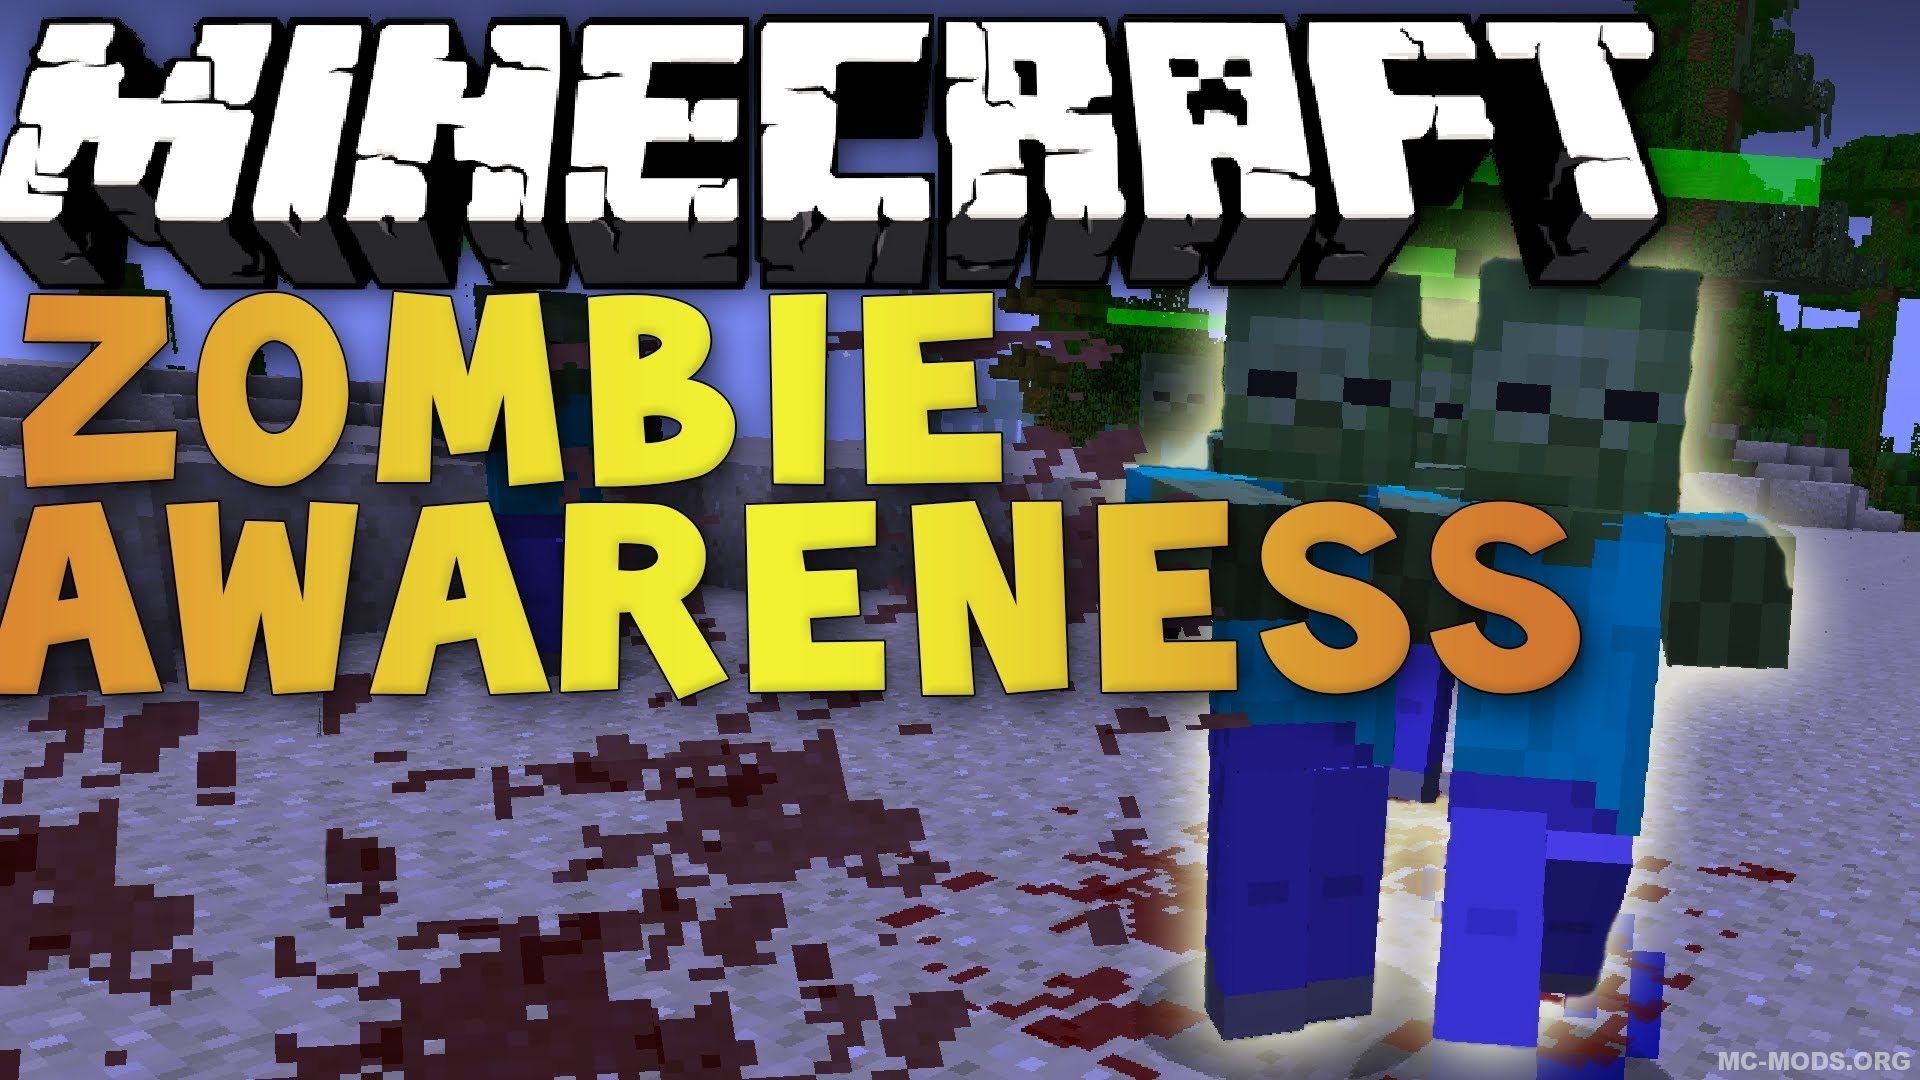 скачать мод на майнкрафт 1.7.10 zombie awareness jar